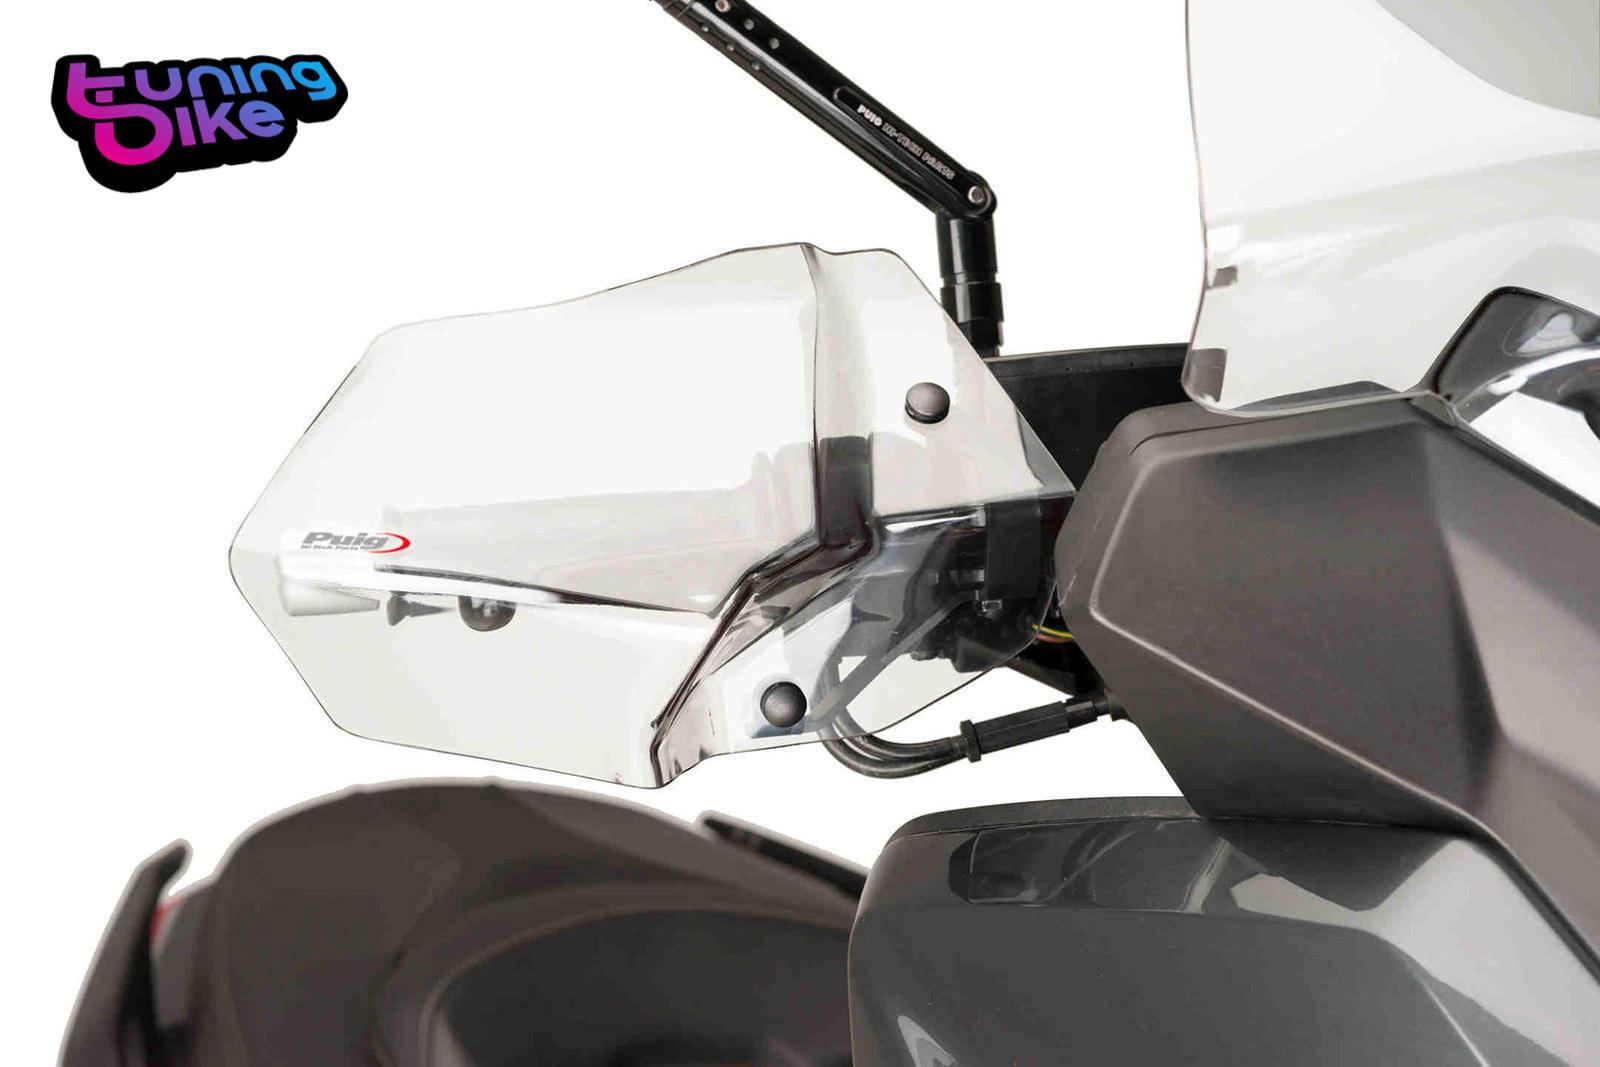 Embouts de Guidon Puig Yamaha X-Max 400 13-18 court rouge